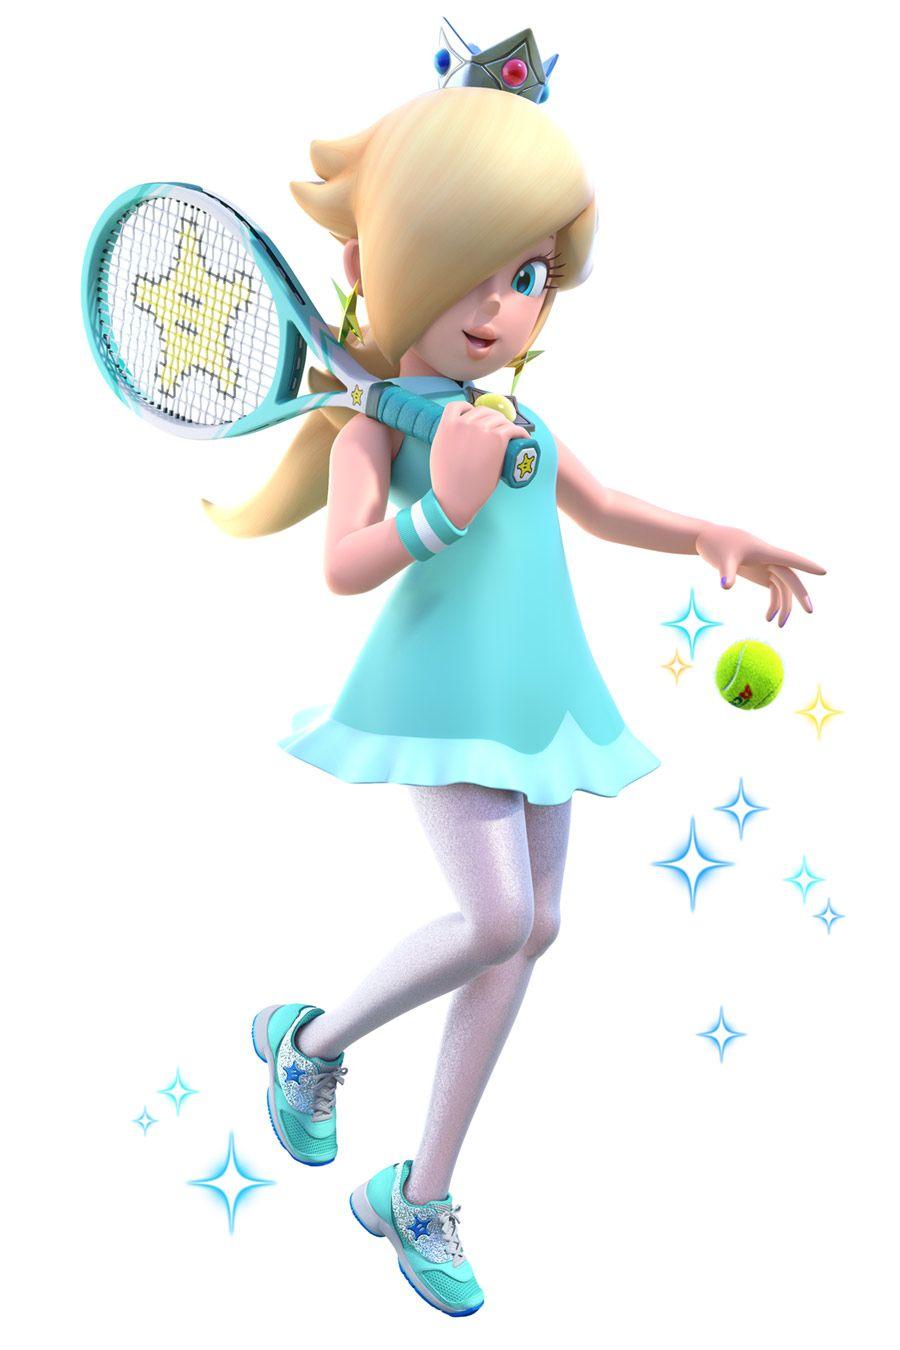 Rosalina From Mario Tennis Aces Illustration Artwork